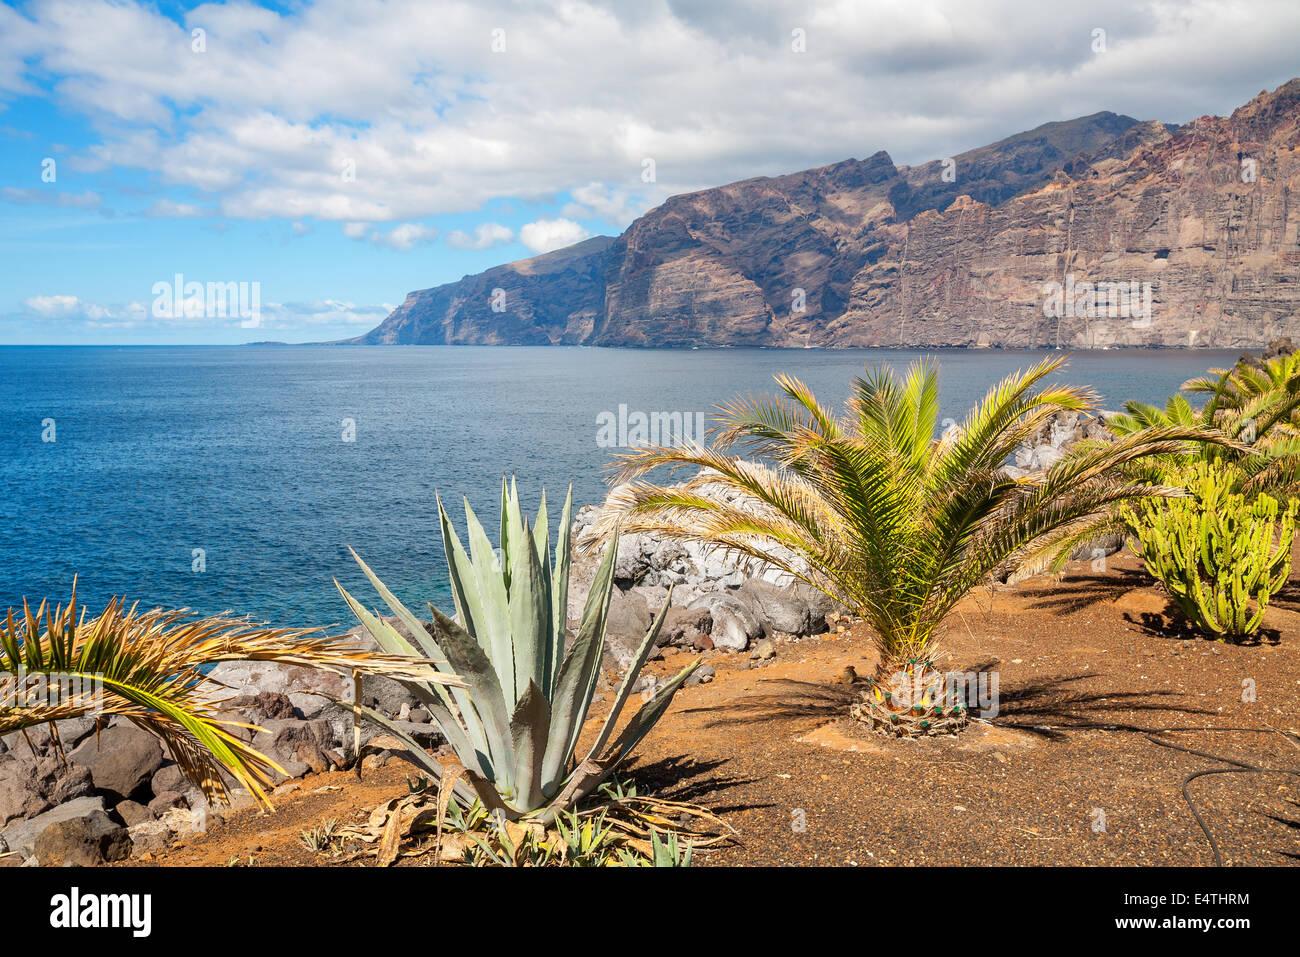 Los Gigantes. Tenerife, Spain - Stock Image